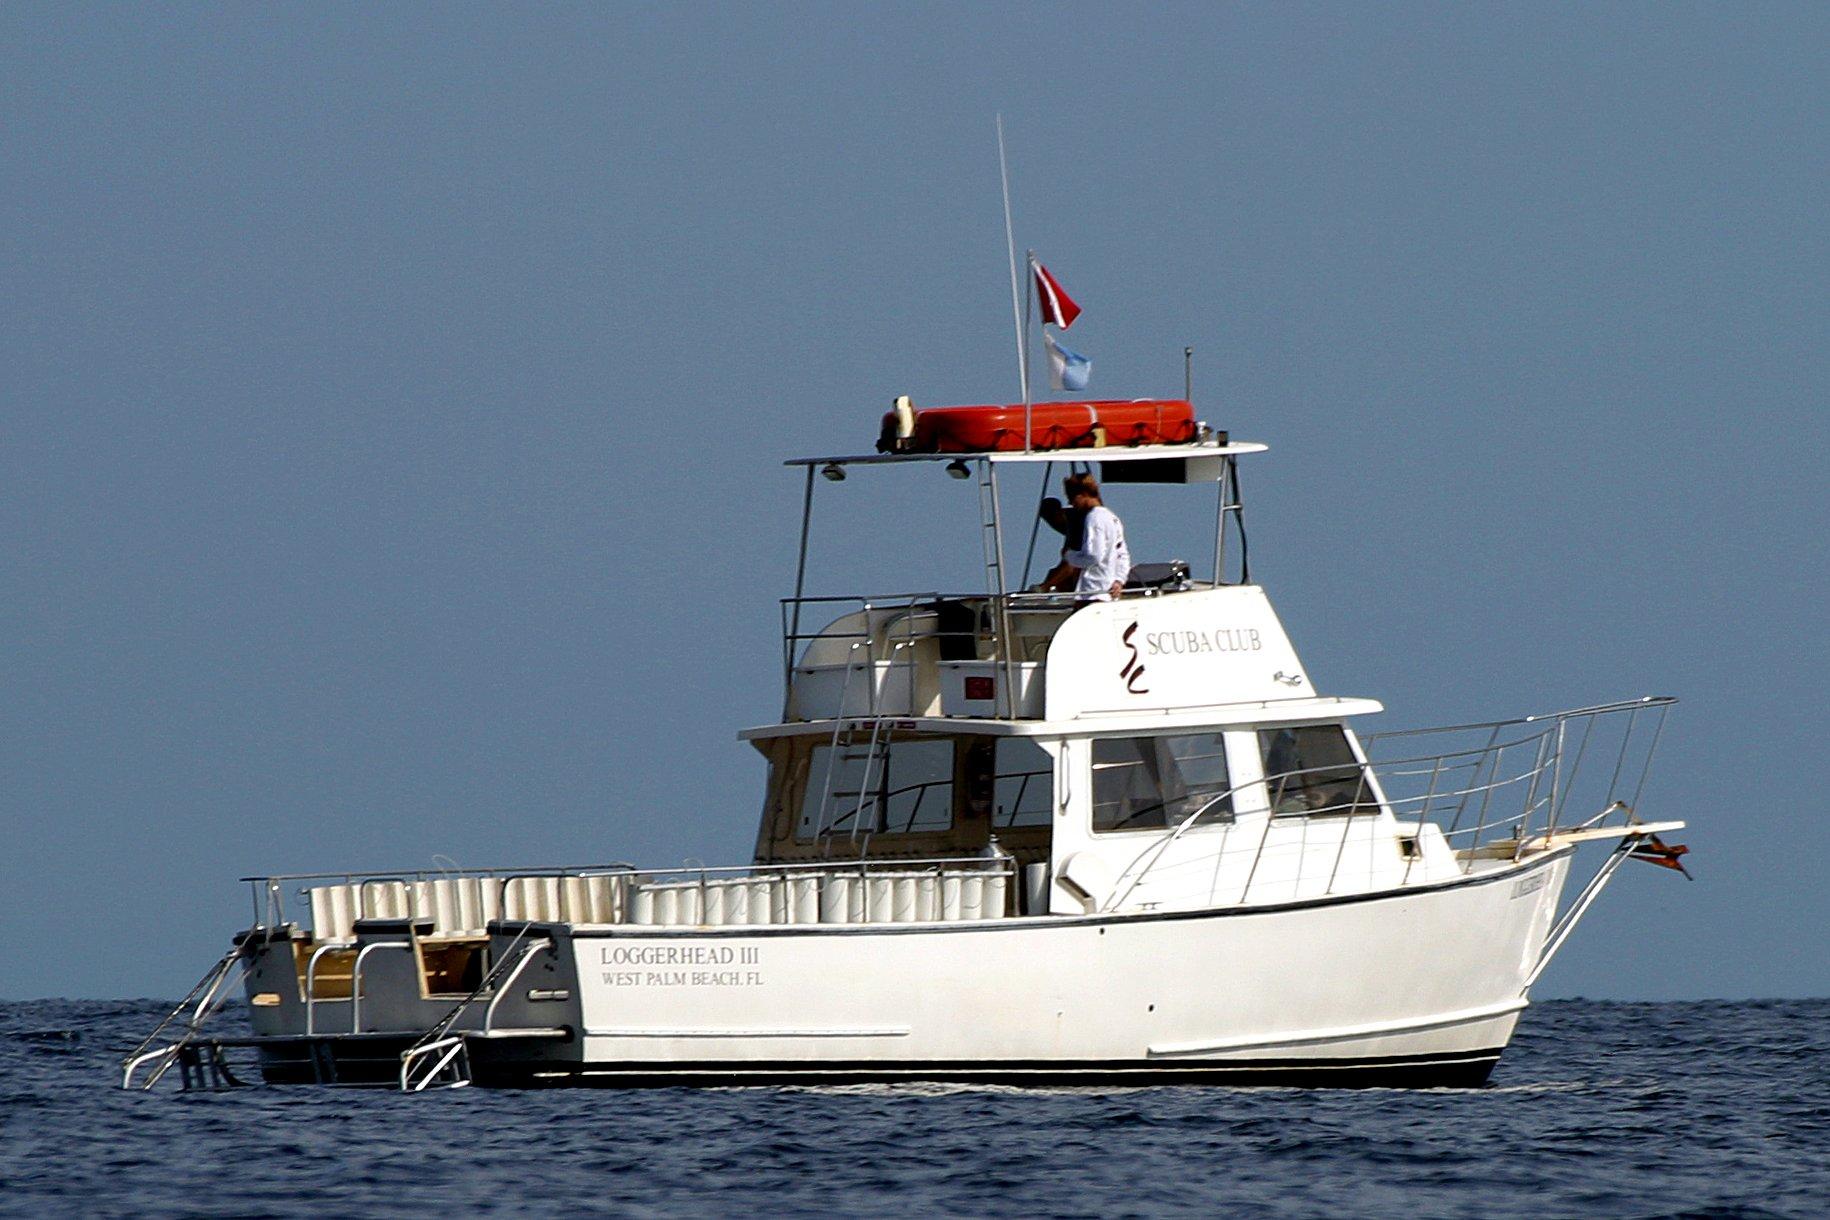 Scuba Club Charter Dive Boat